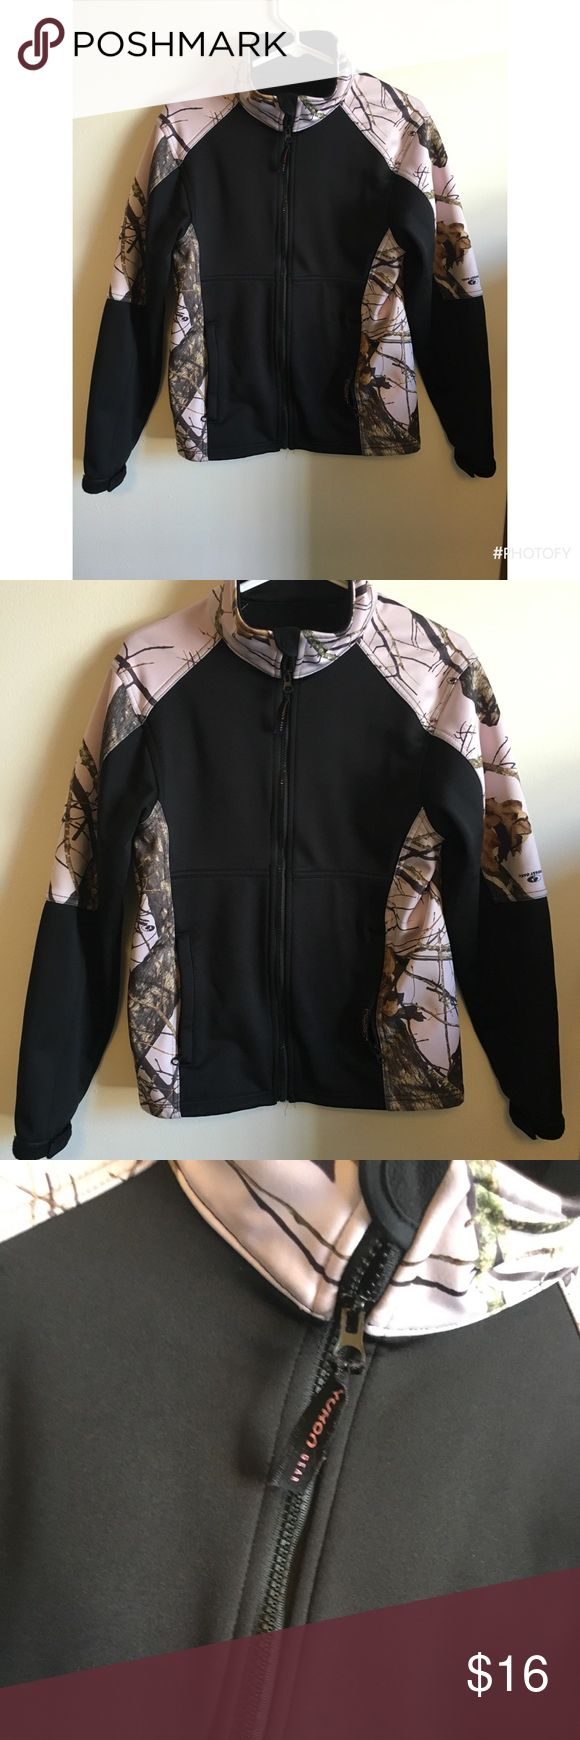 Yukon Pink Camo Jacket Warm and comfy. Fleece lined. Looks new yukon Jackets & Coats Utility Jackets